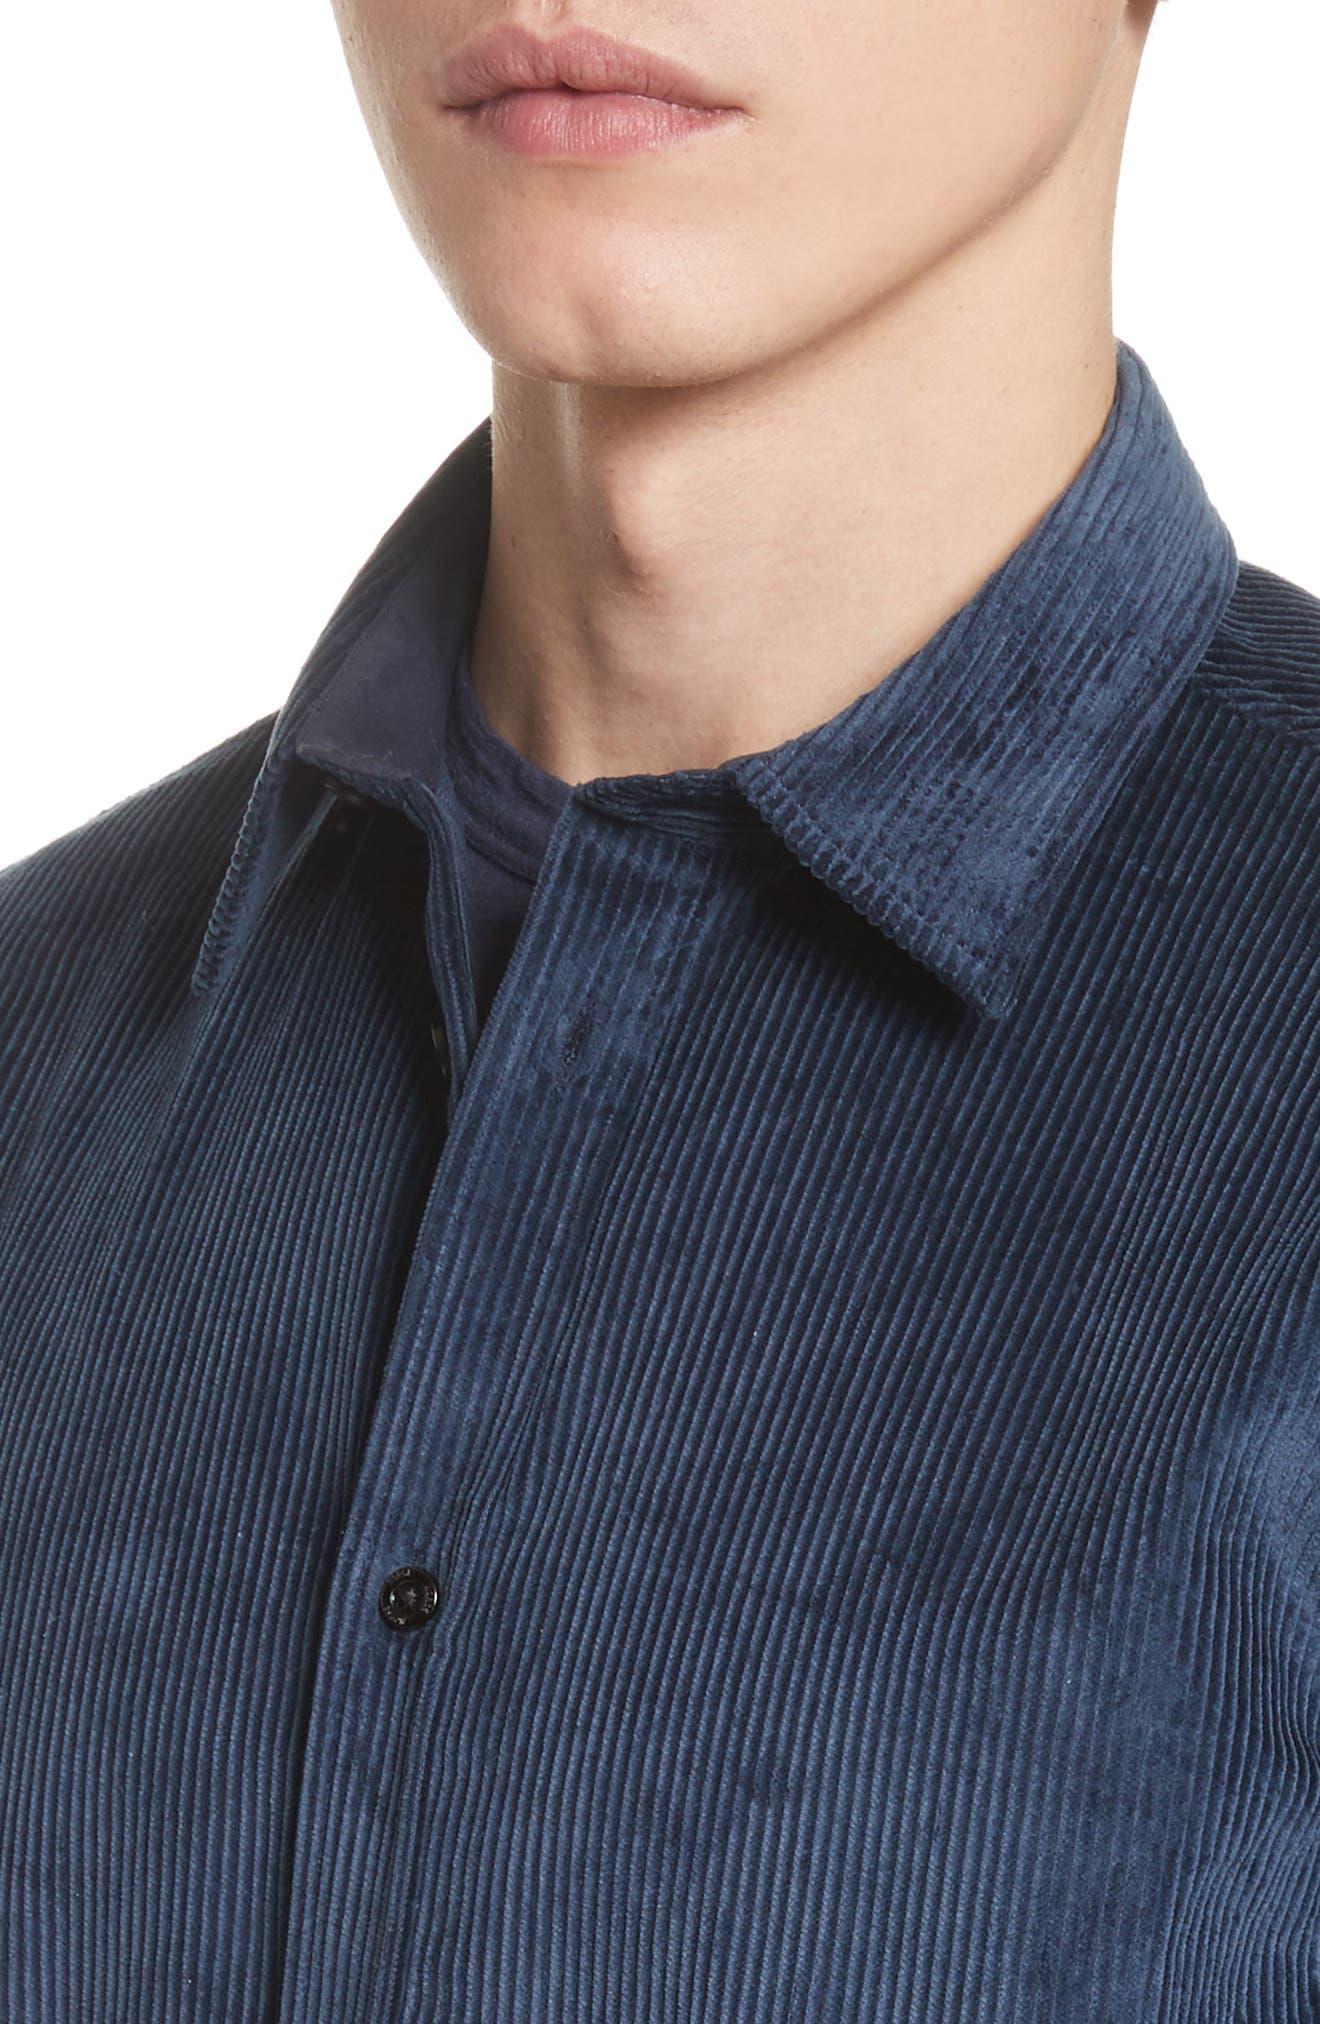 Hans Corduroy Shirt,                             Alternate thumbnail 5, color,                             405